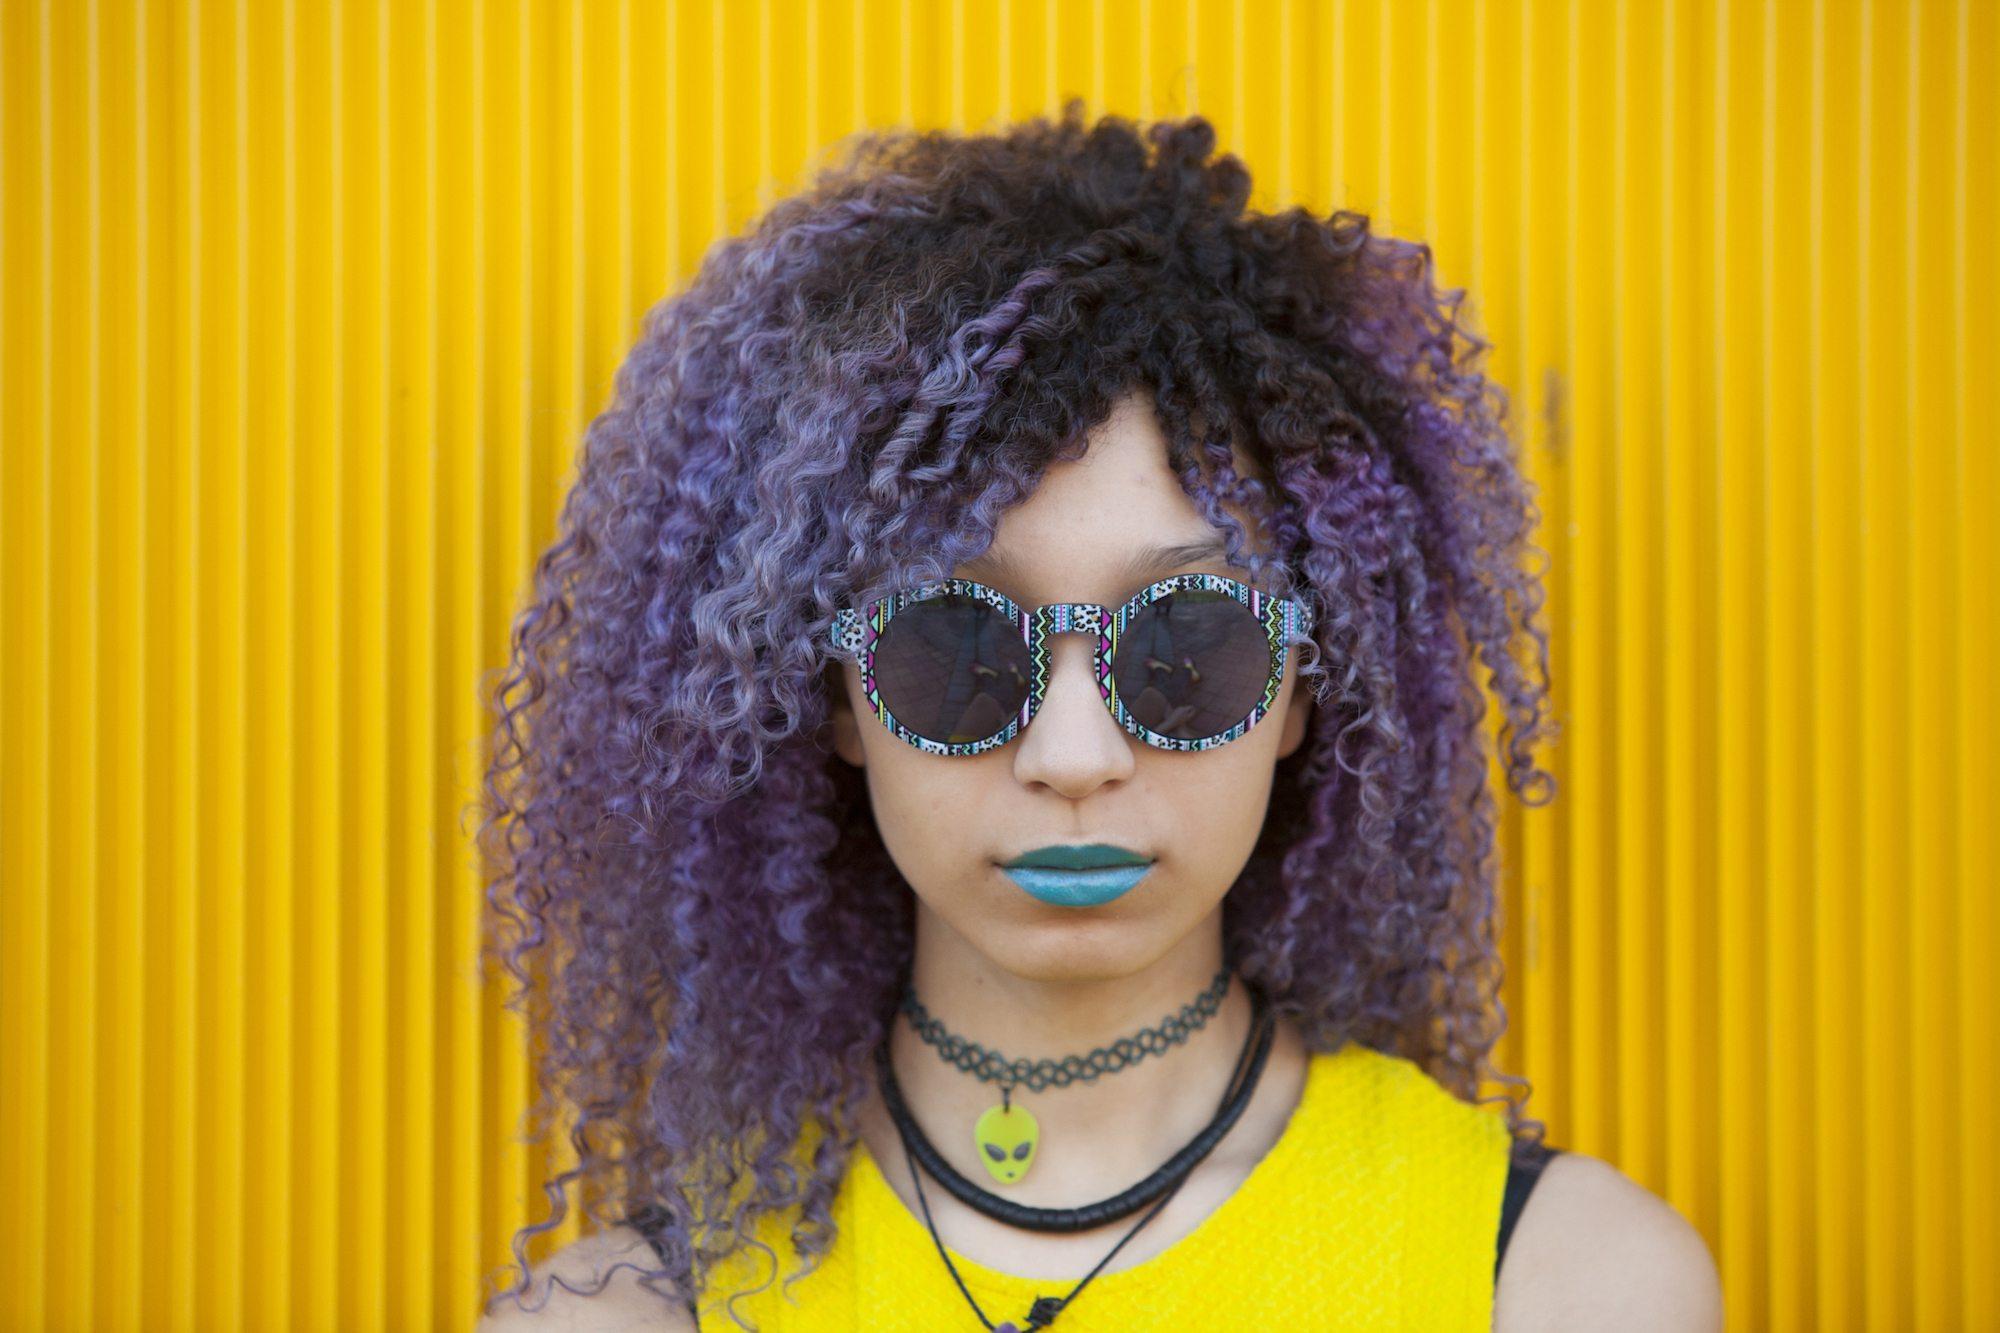 Akar rambut hitam dan lavender rambut dua warna.